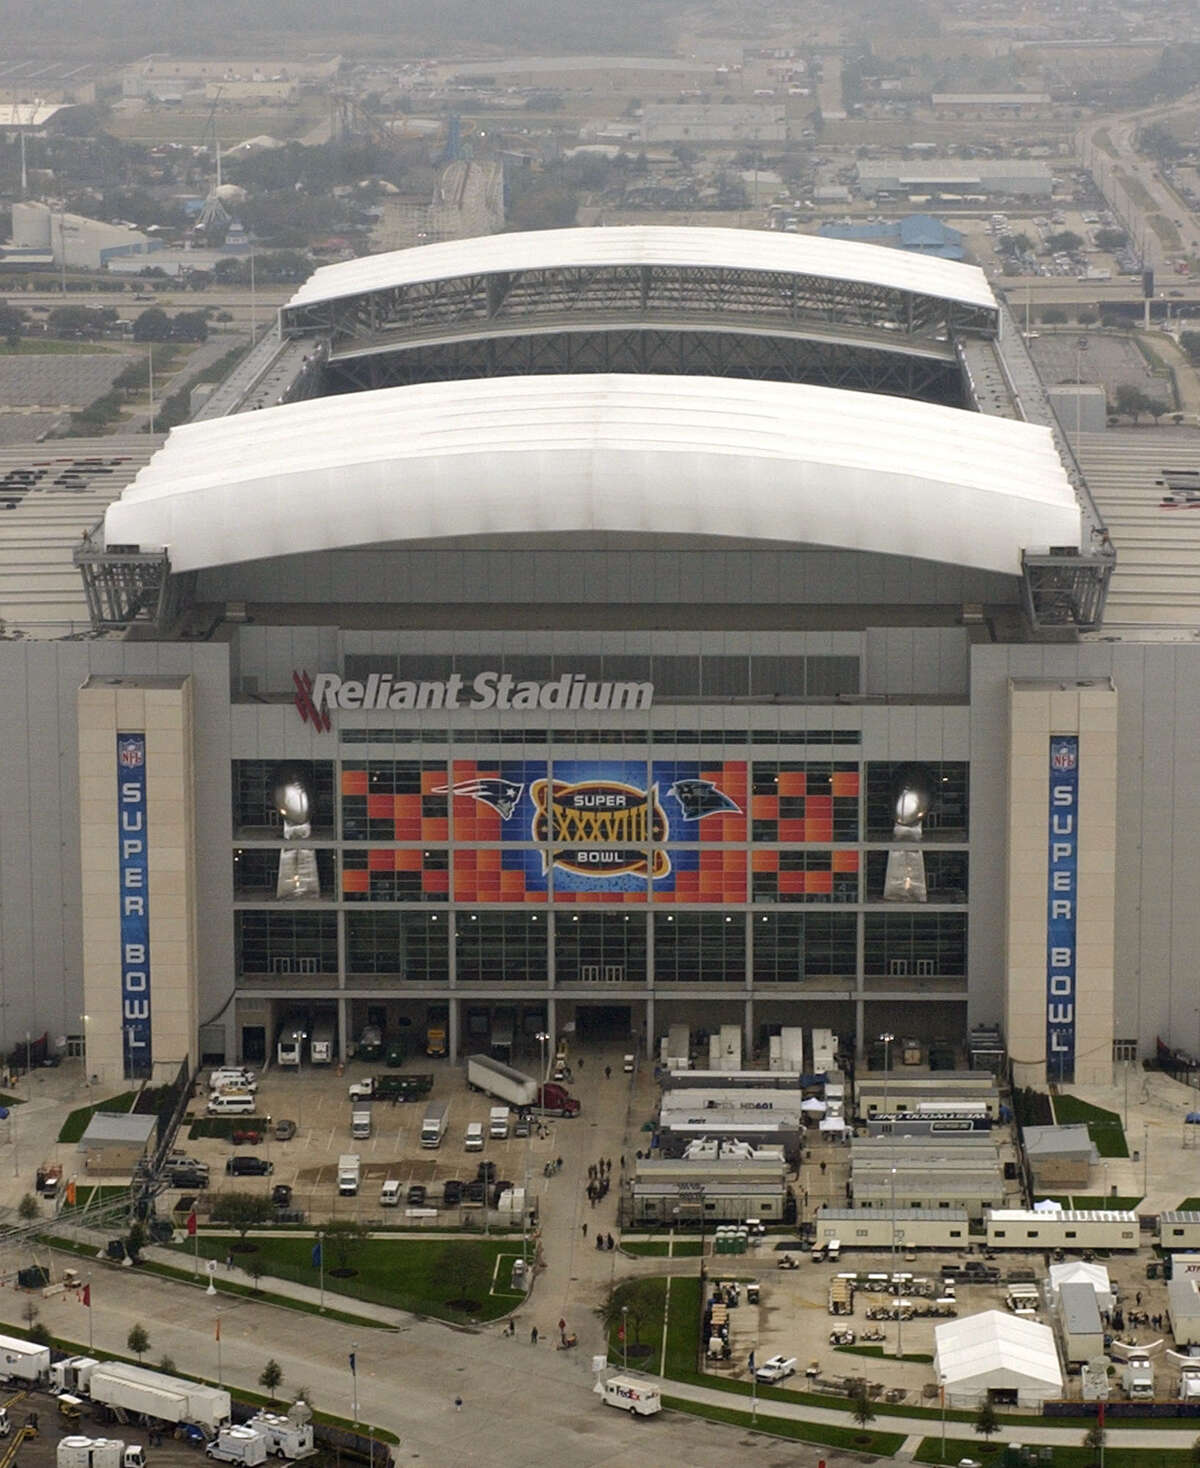 2004: Then-Reliant Stadium hosted Super Bowl XXXVIII.